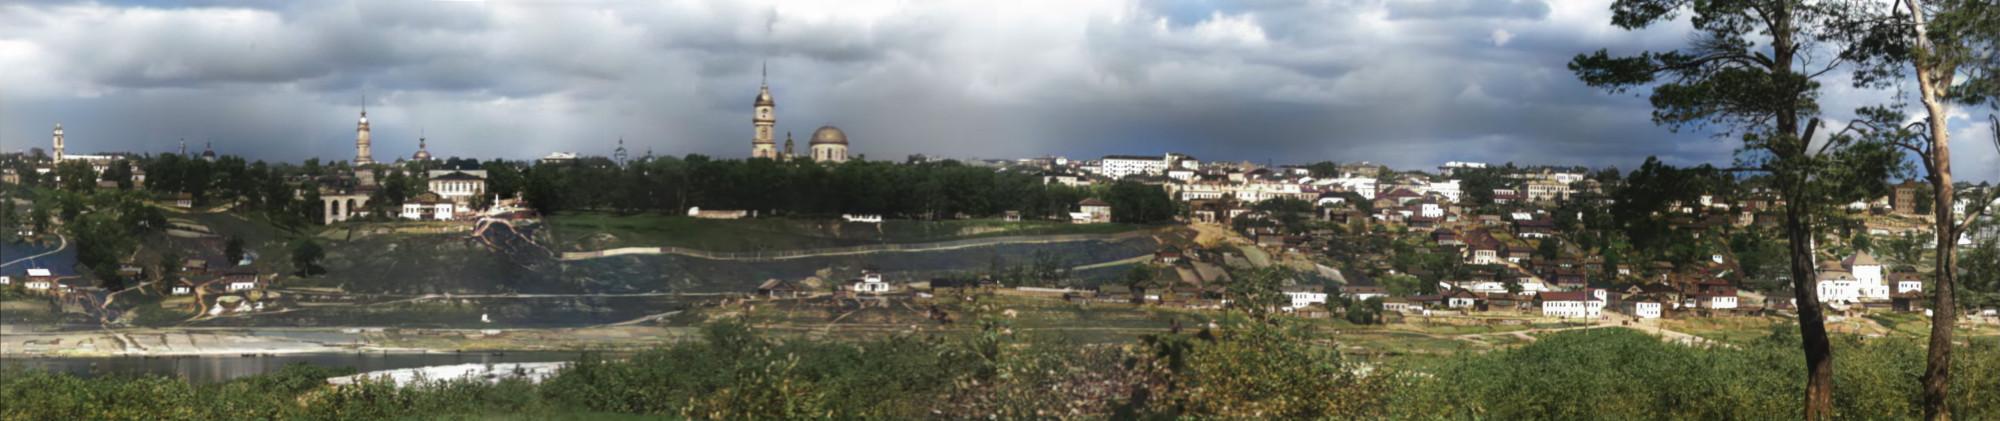 1951 панорама Калуги